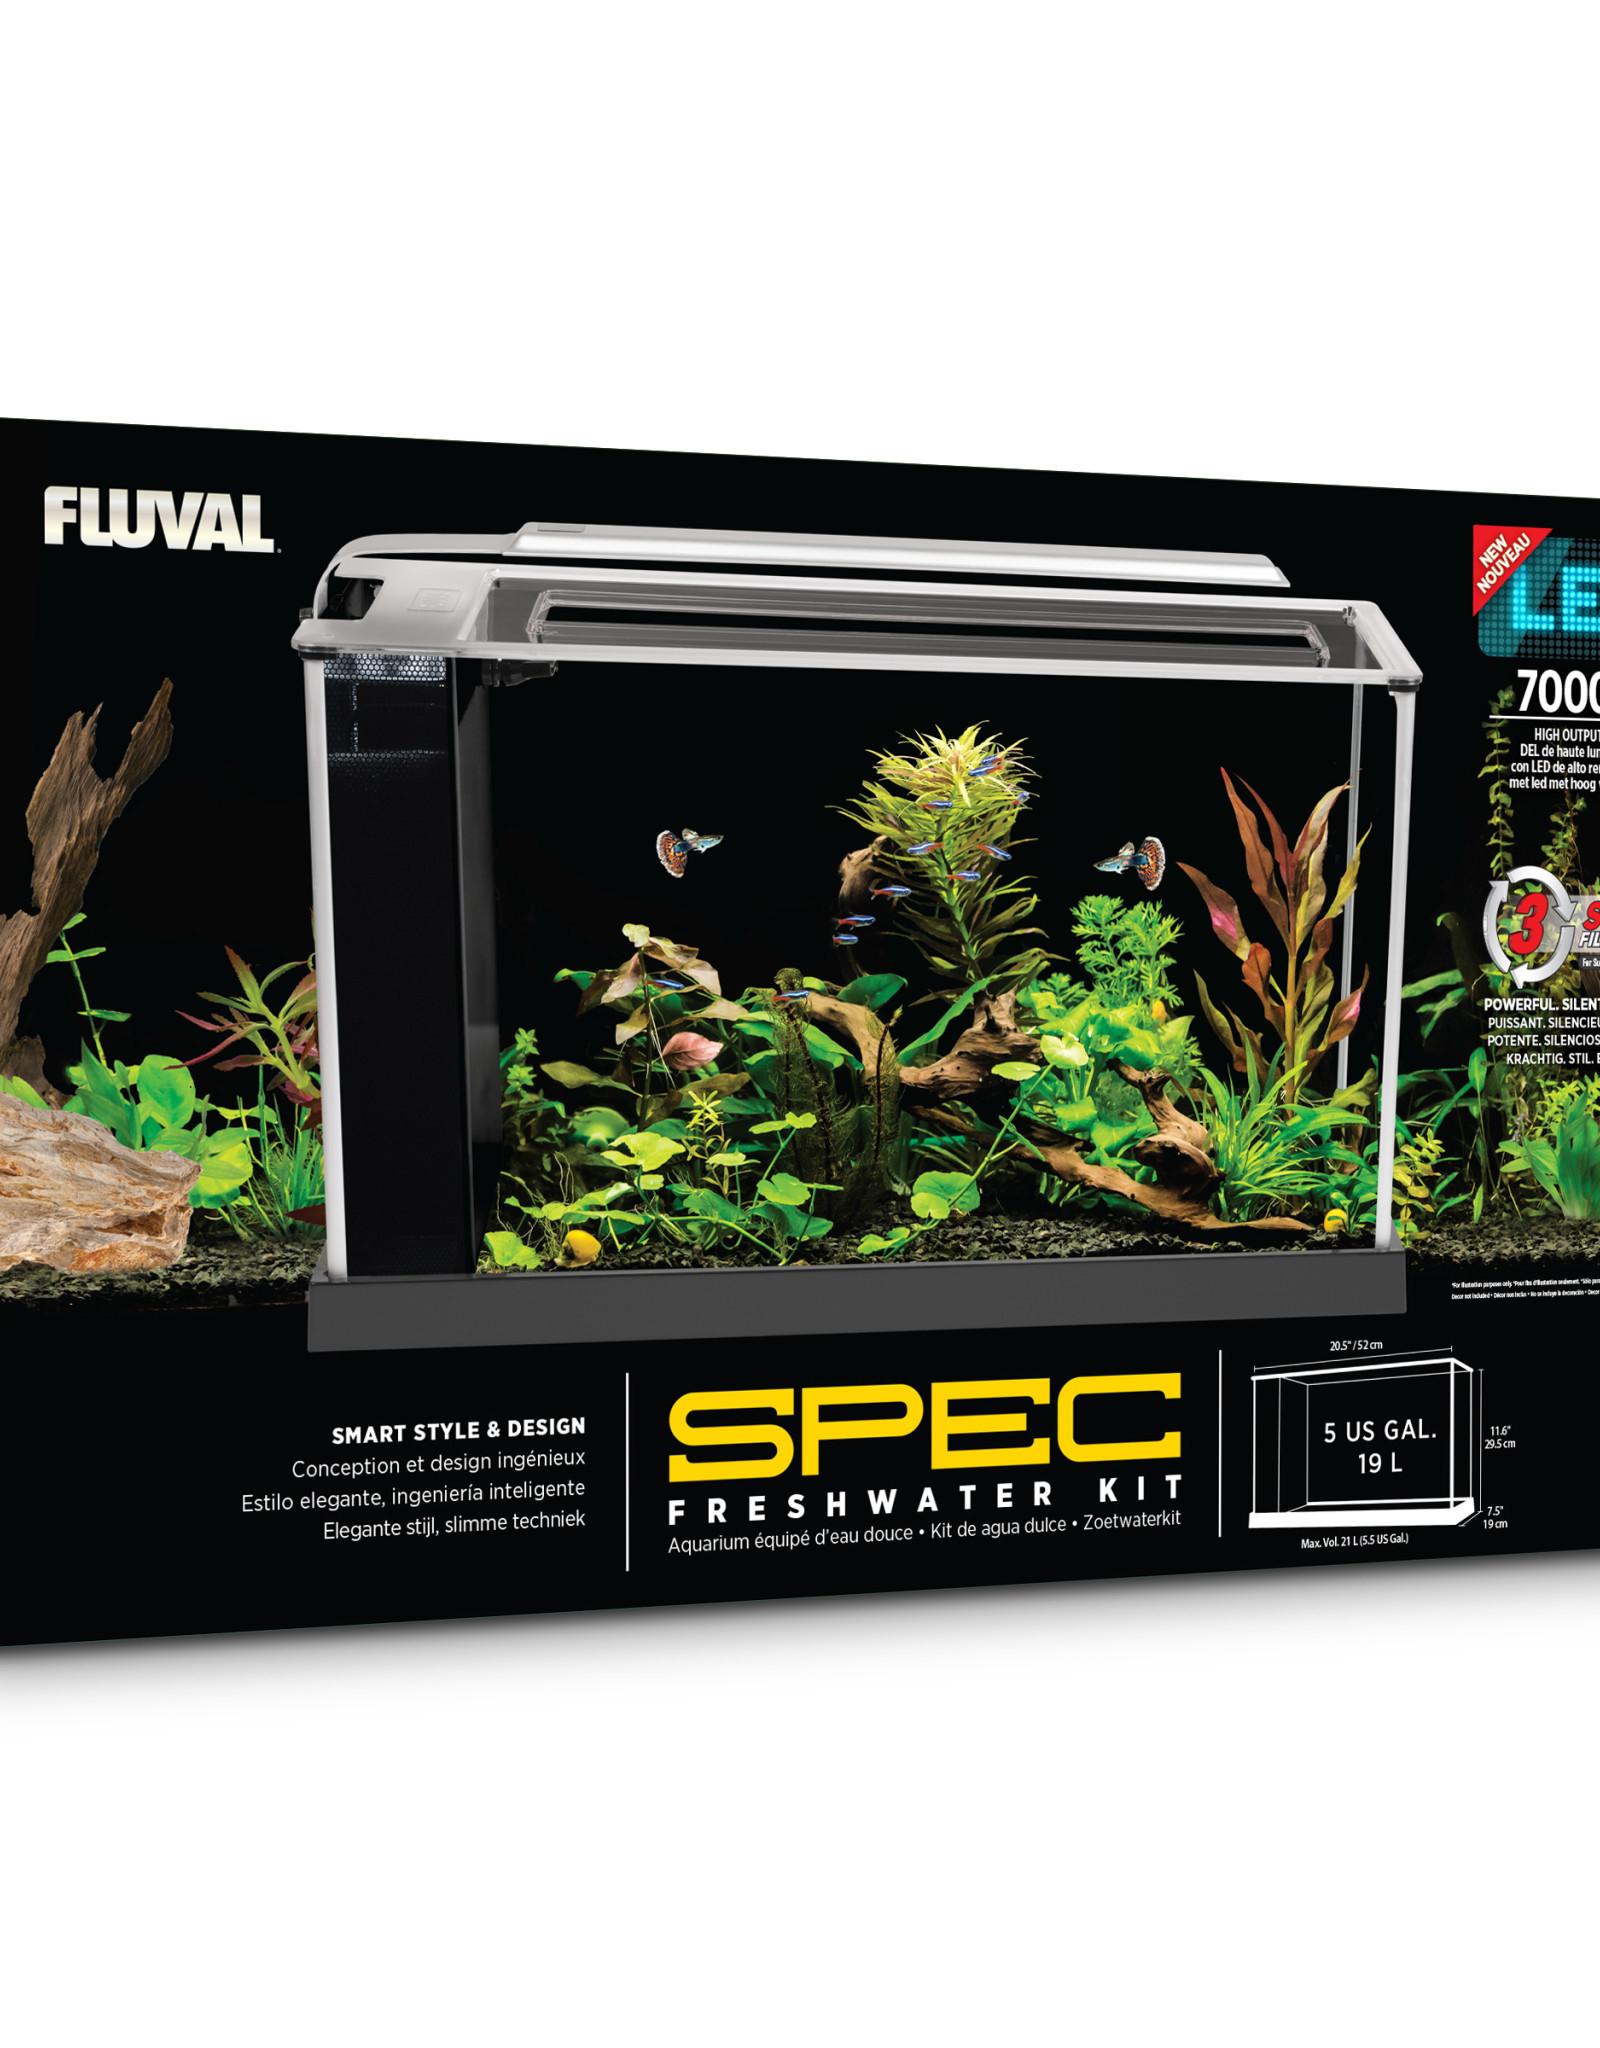 Fluval Sea Fluval Spec V Aquarium Kit 5 gal.